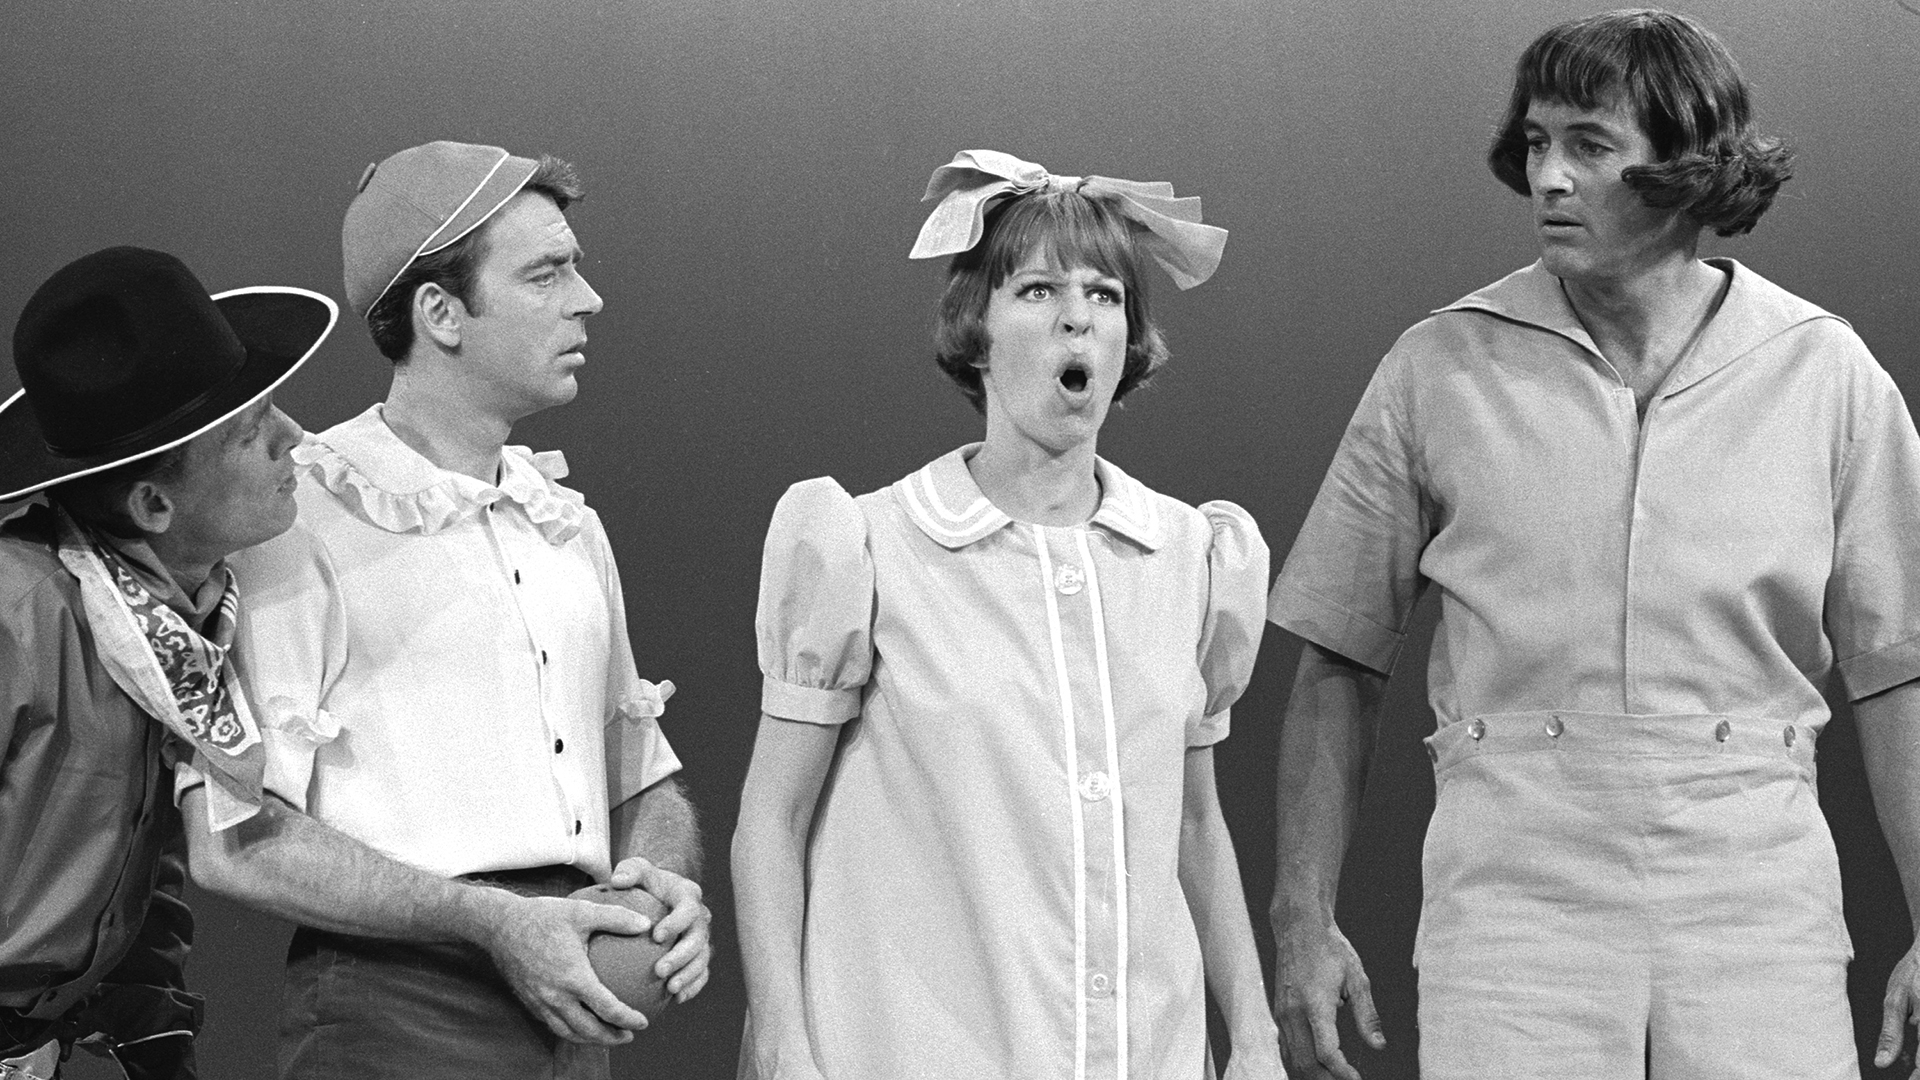 Carol Burnett with Frank Gorshin, Ken Berry, and Rock Hudson in the 1966 TV movie Carol and Company.